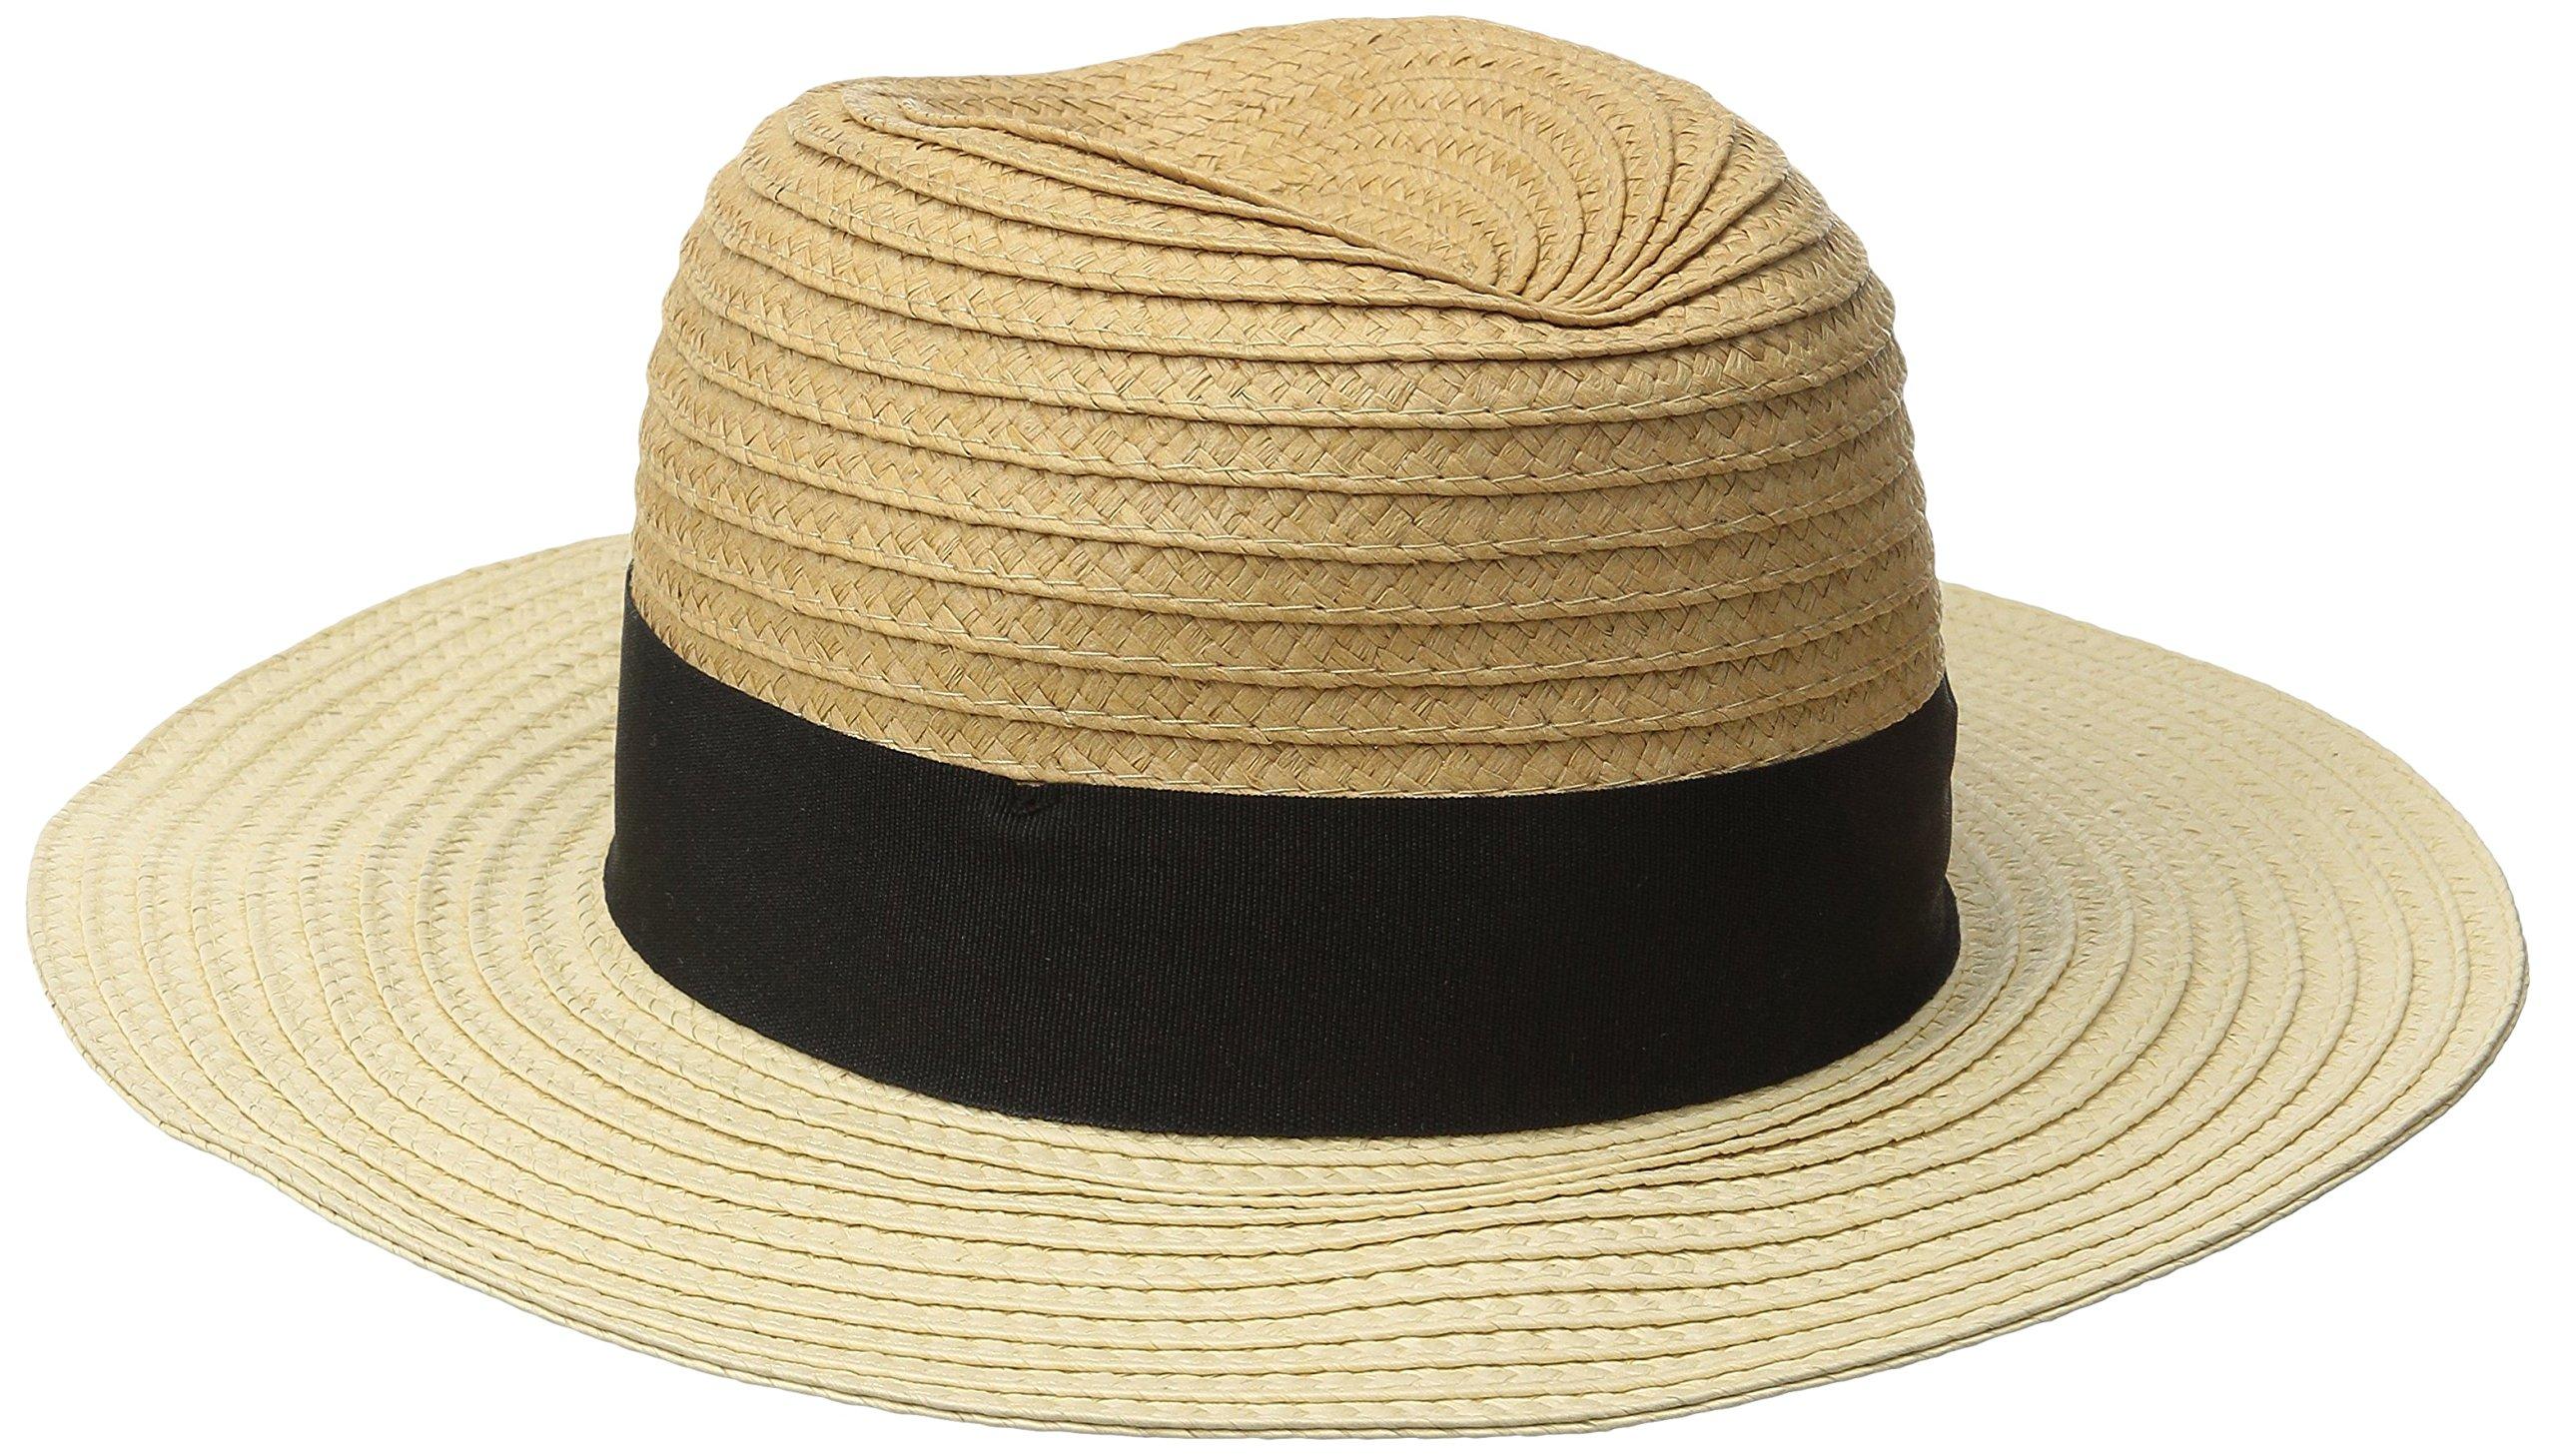 Goorin Bros. Women's Bobisha Two Tone Wide Brim Fedora Hat, Camel, Large